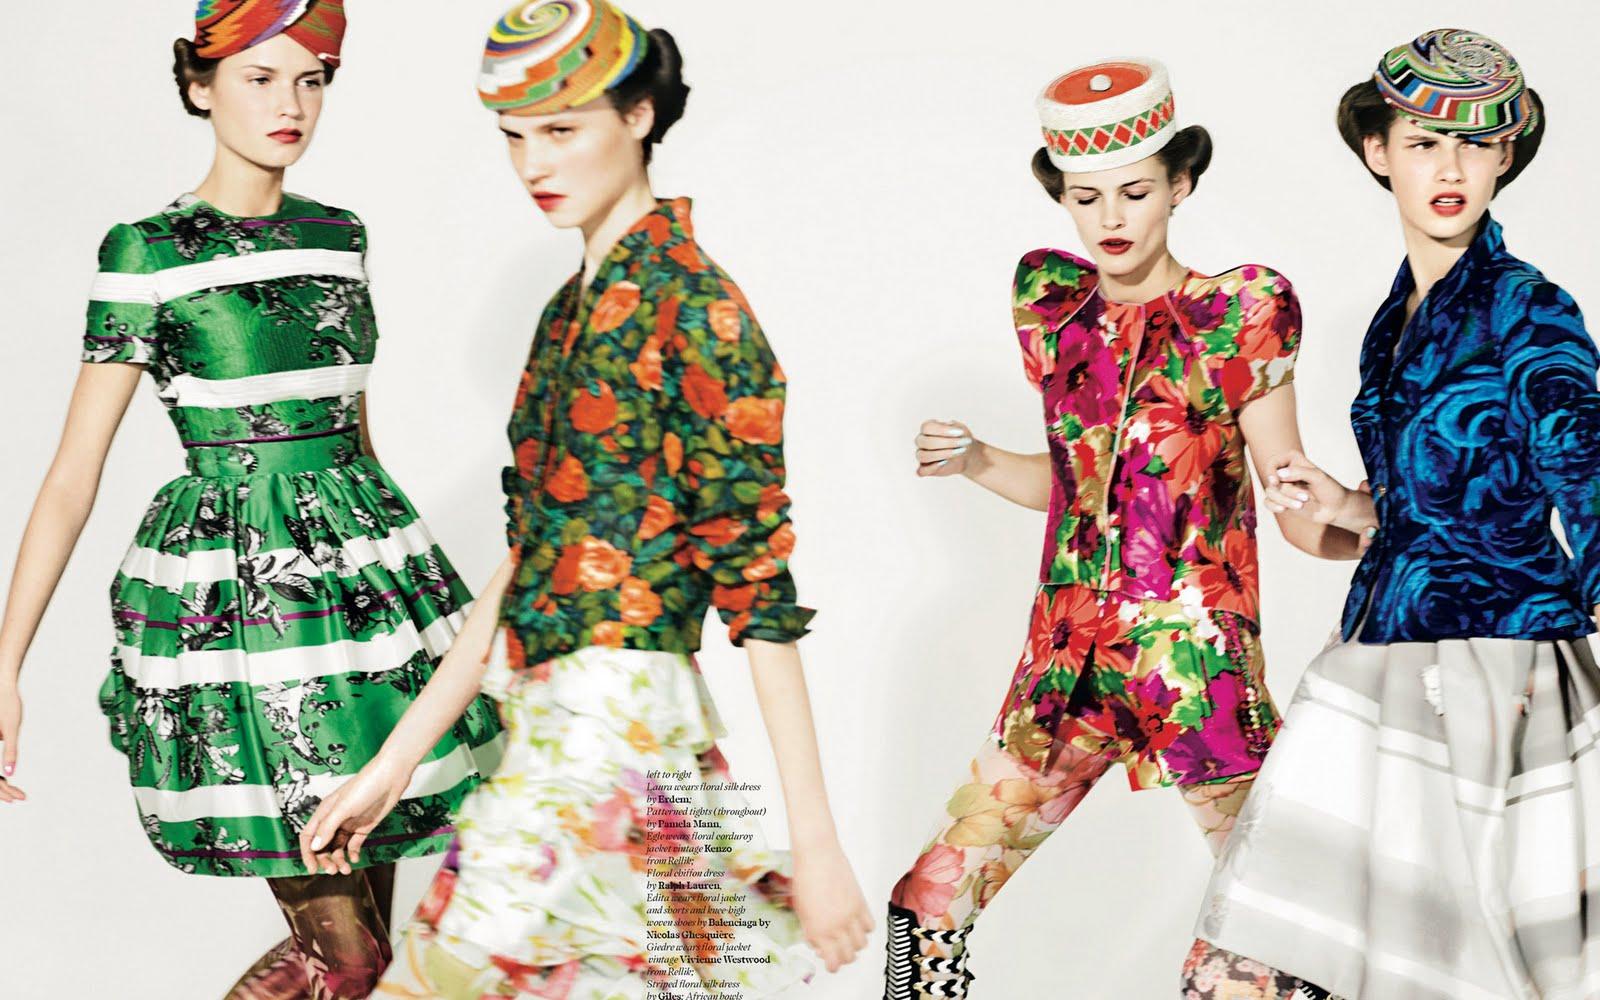 Girls-Fashion-Wallpapers-15.jpg